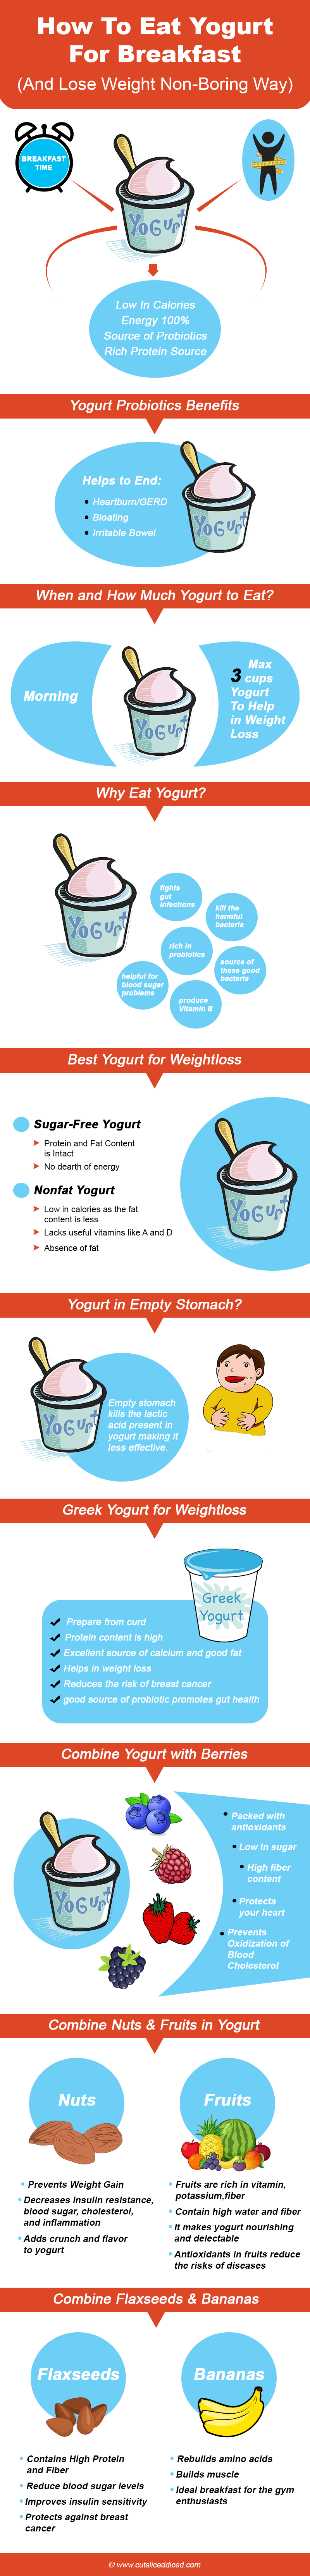 How To Eat Yogurt For Breakfast